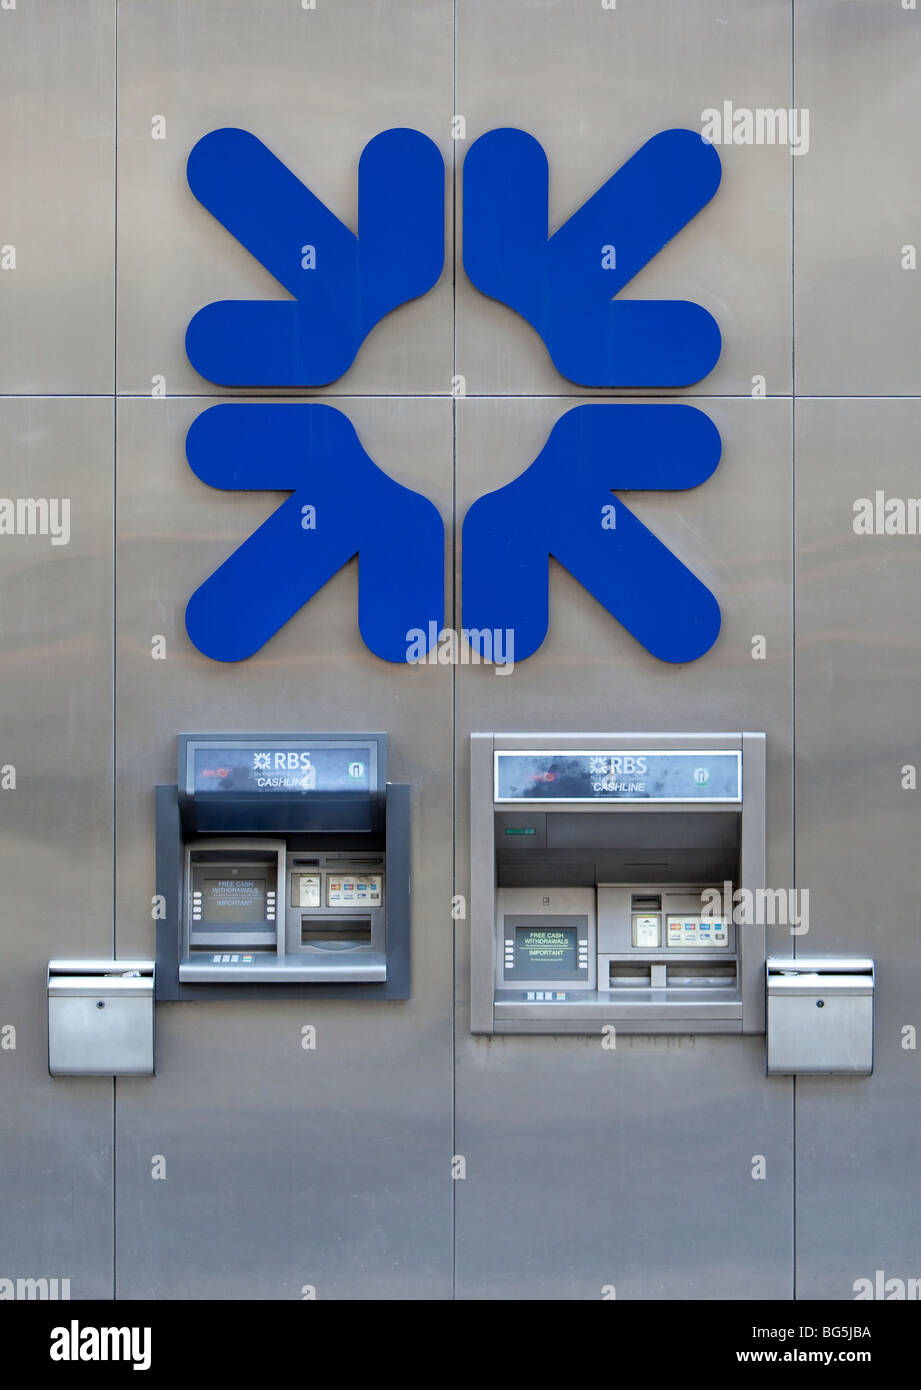 Royal Bank of Scotland RBS signer/logo Photo Stock